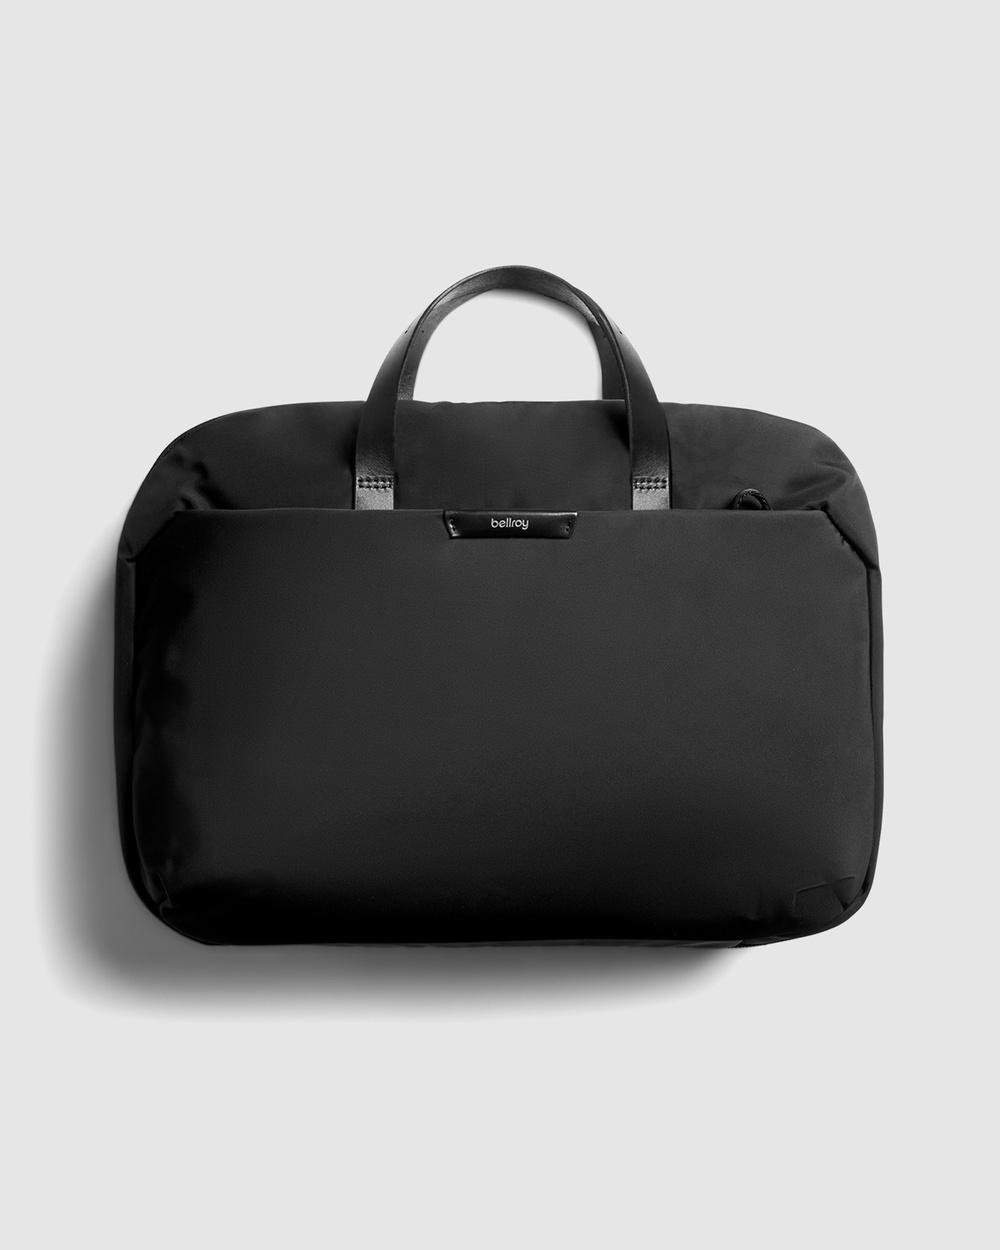 Bellroy Flight Bag Duffle Bags Black